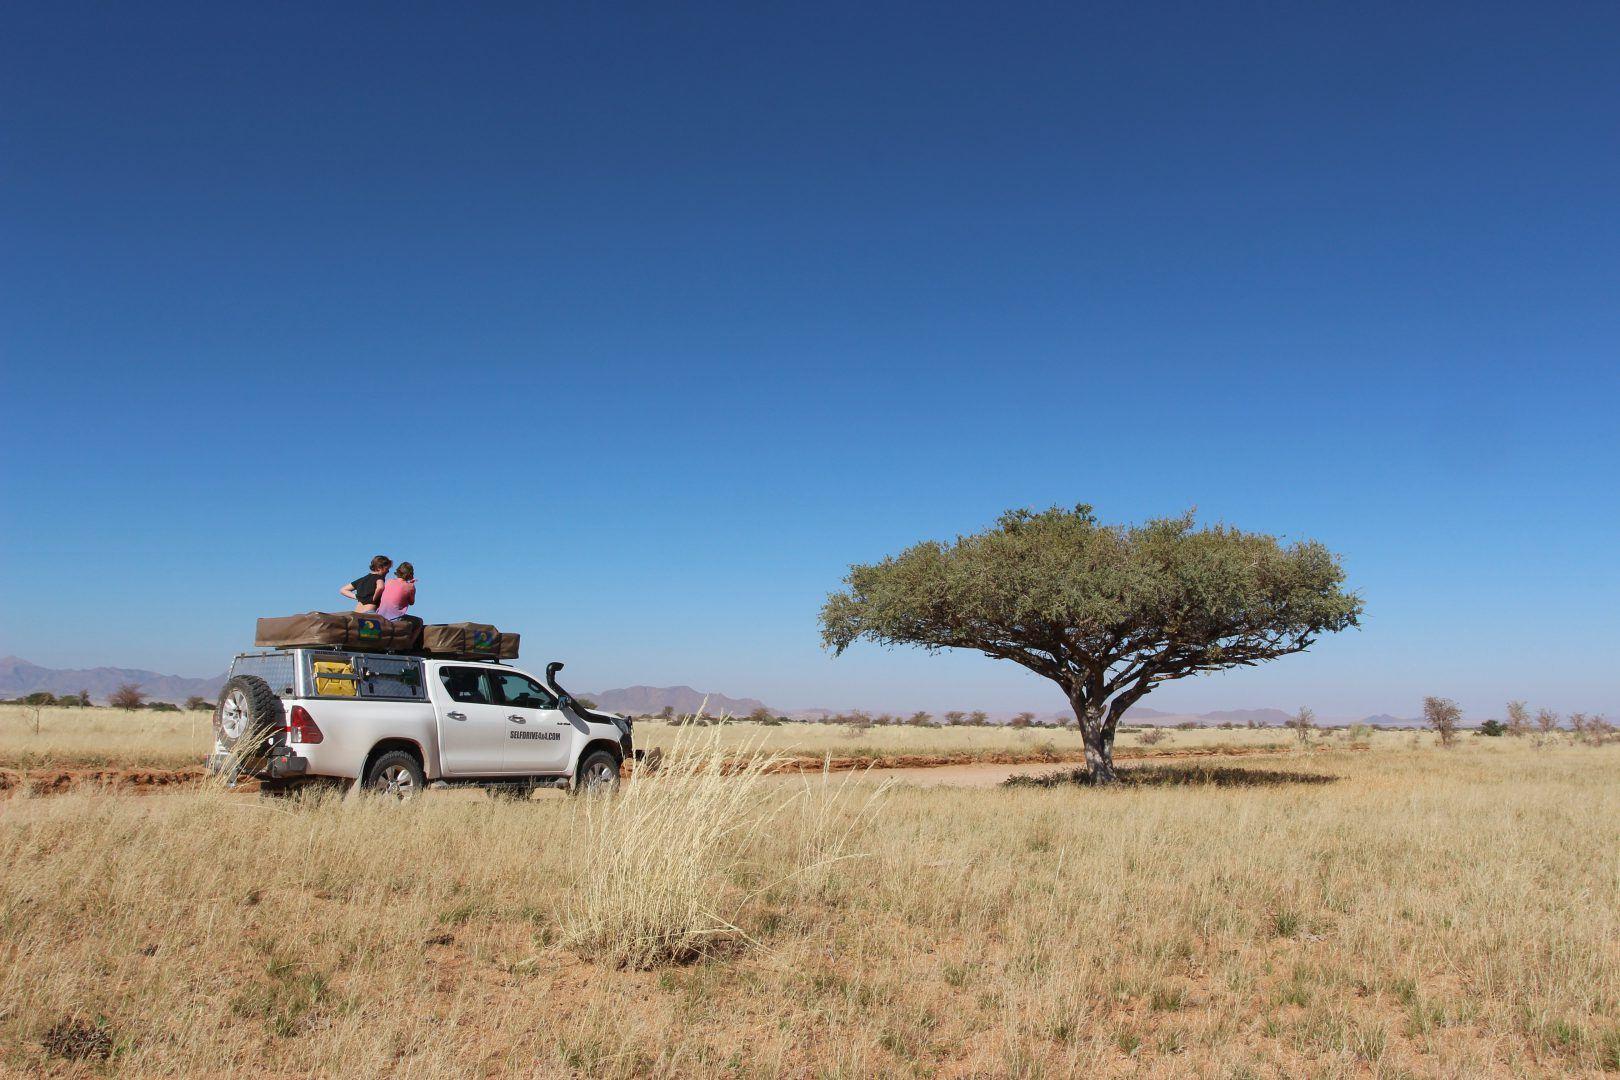 Namibia Self Drive 14 days - 4x4 kampeerreis  Selfdrive4x4 com